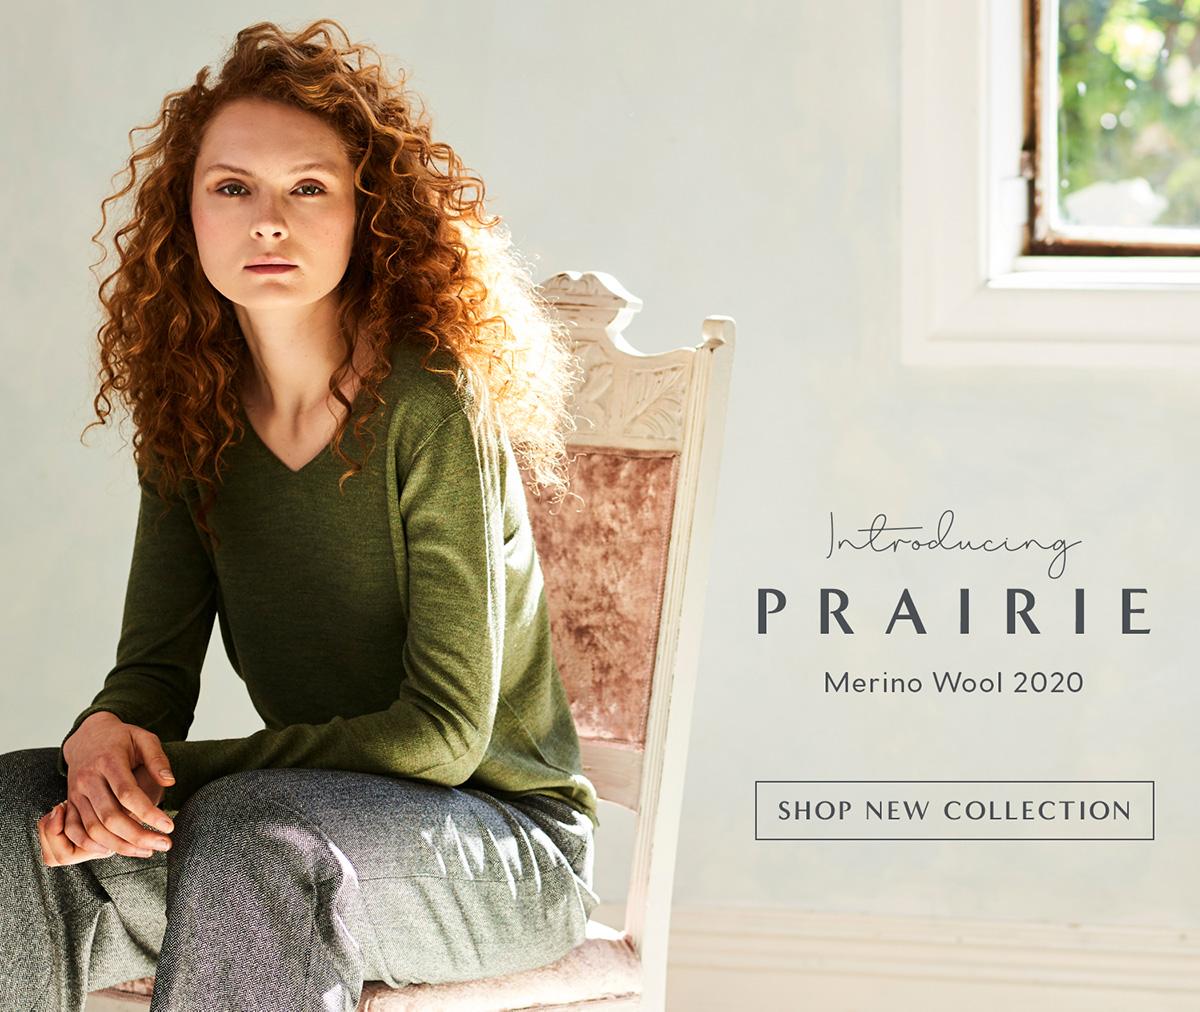 prairie winter 2020 - shop new clothing